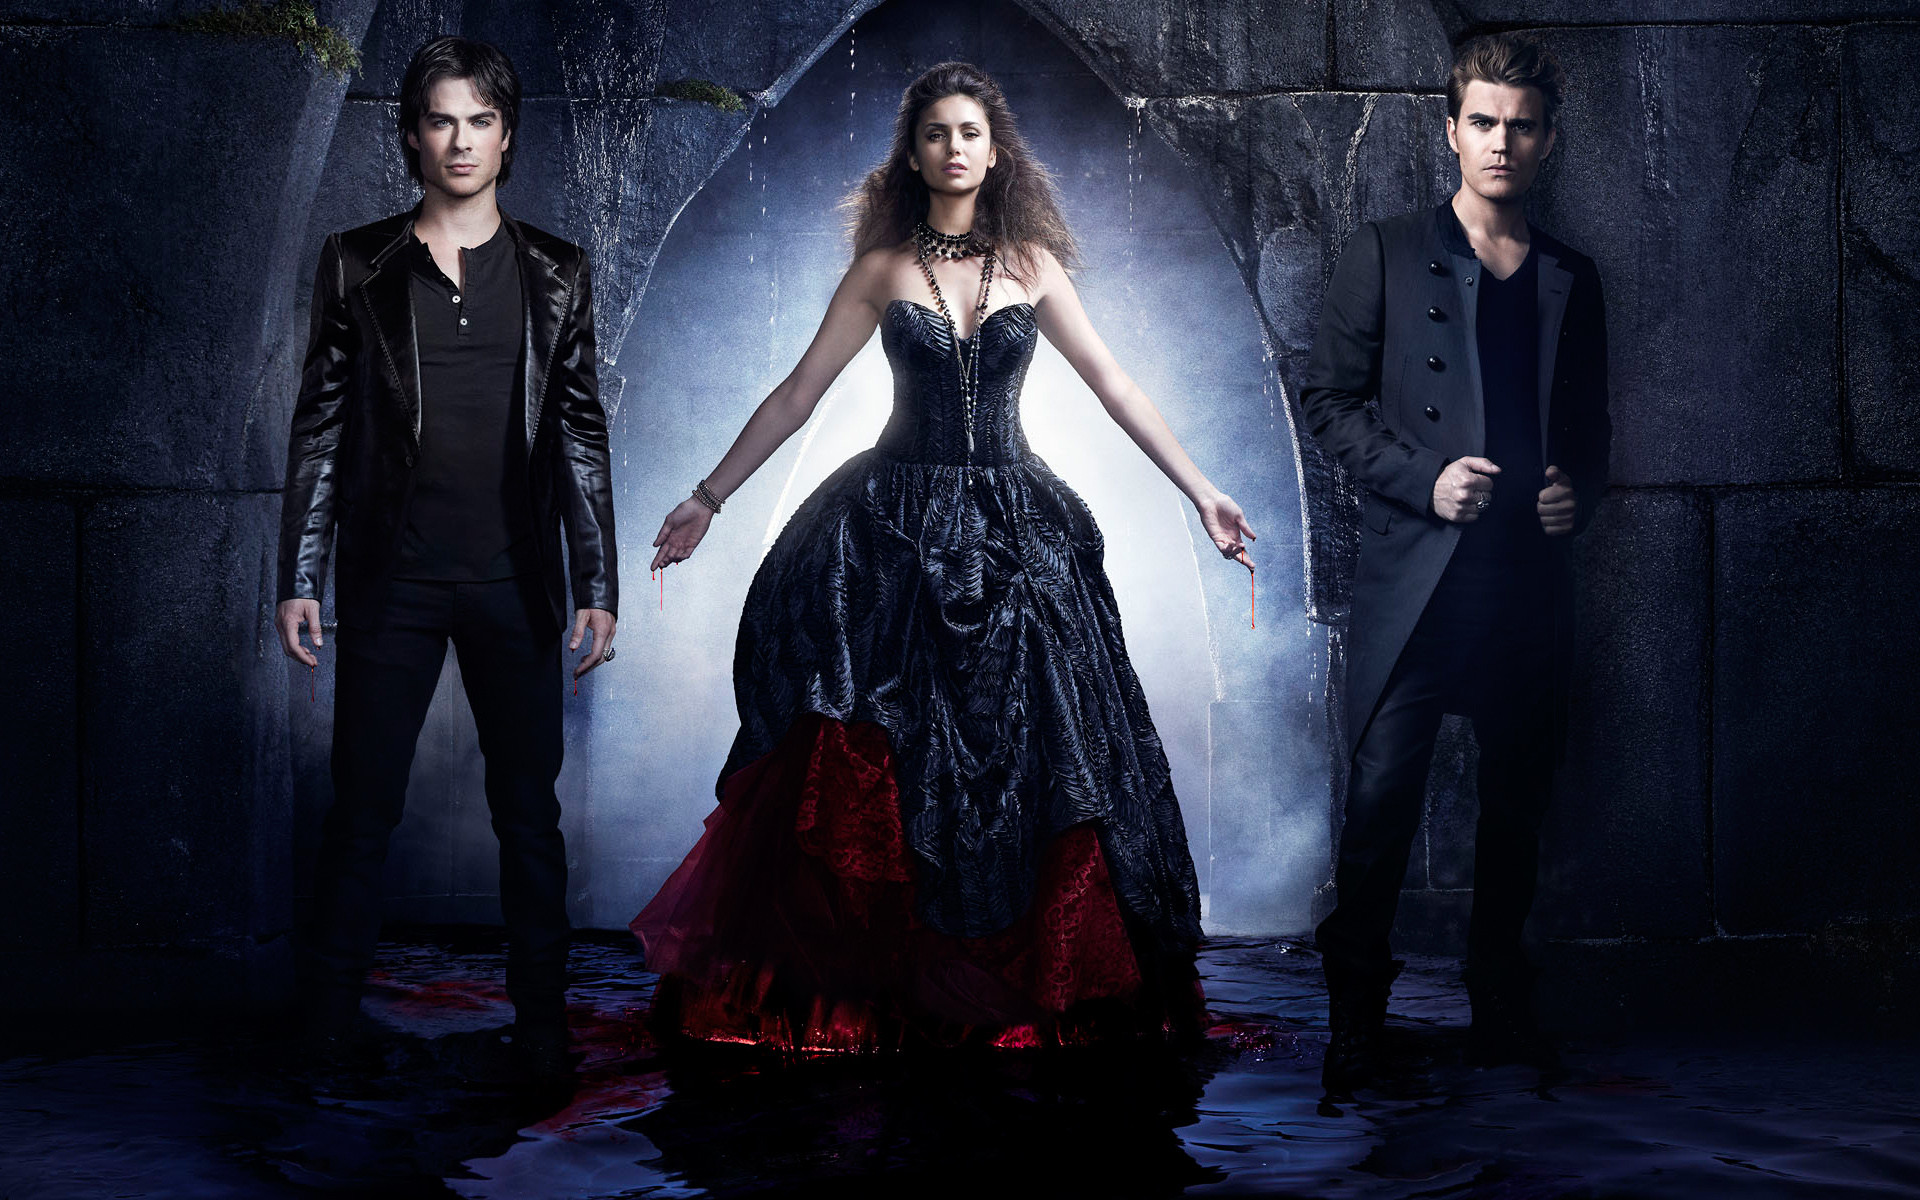 Teen Wolf Phone Wallpaper - Vampires Diary Season 5 , HD Wallpaper & Backgrounds